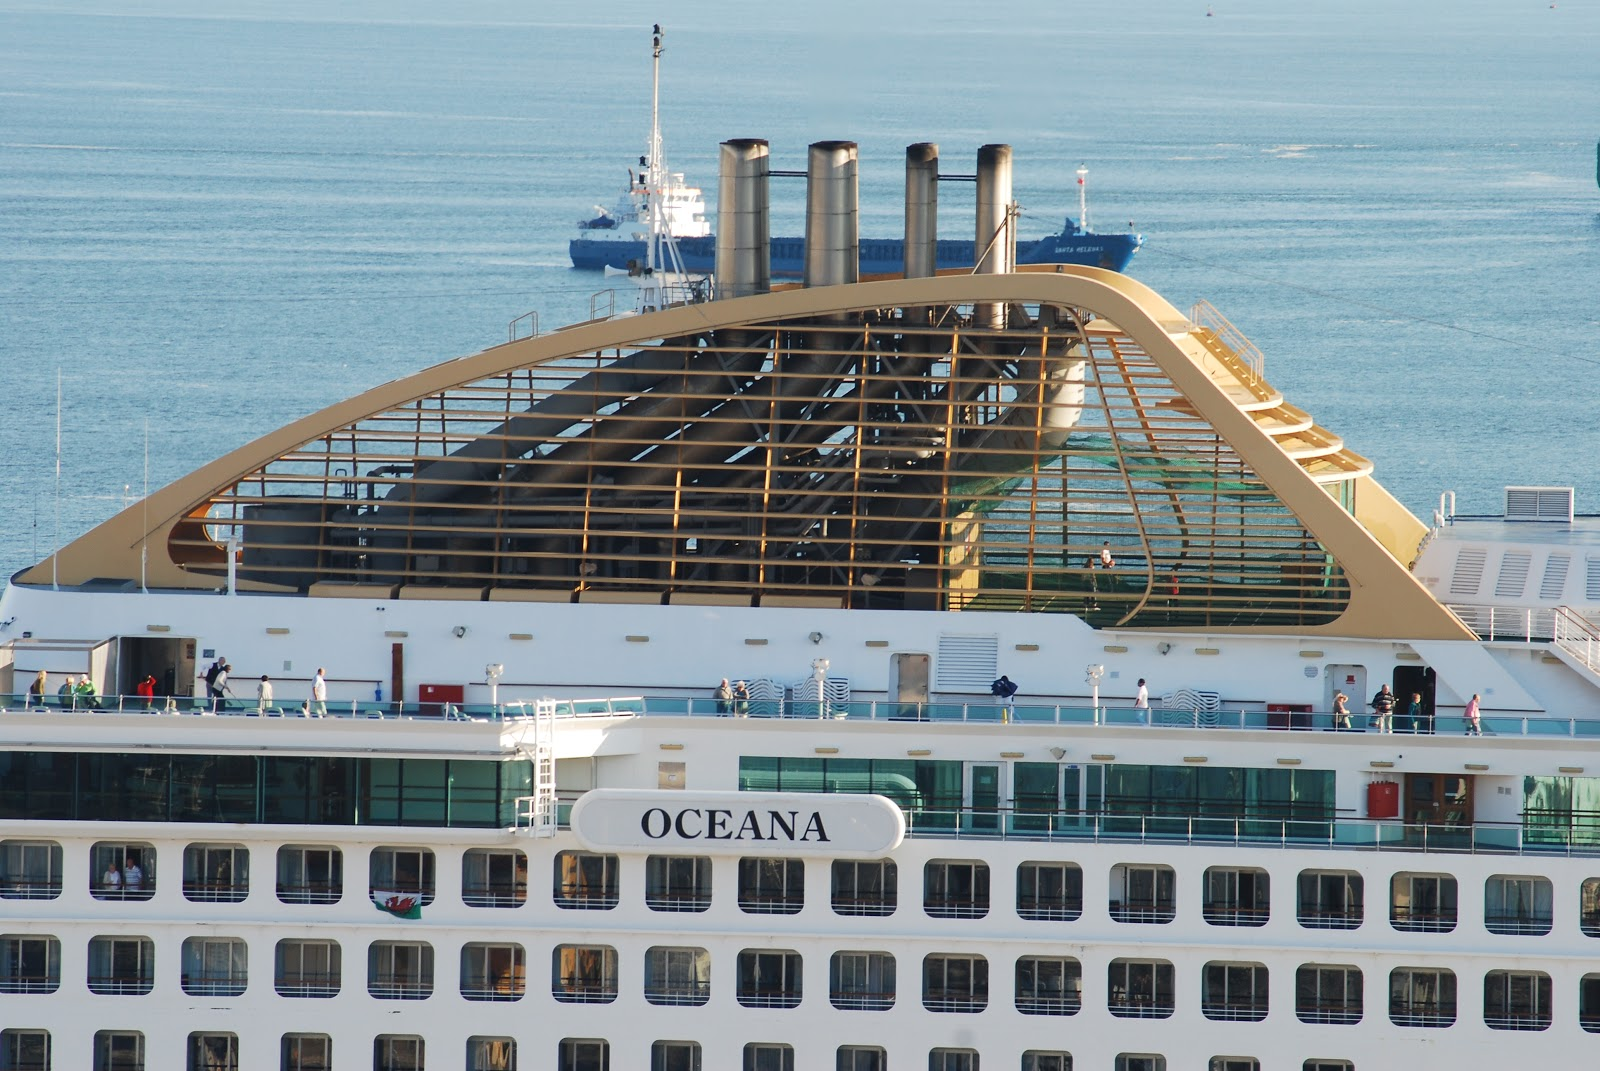 NAVIGATIONCruising And Maritime Themes Cruise Ship OCEANA At Lisbon - Lisbon cruise ship port